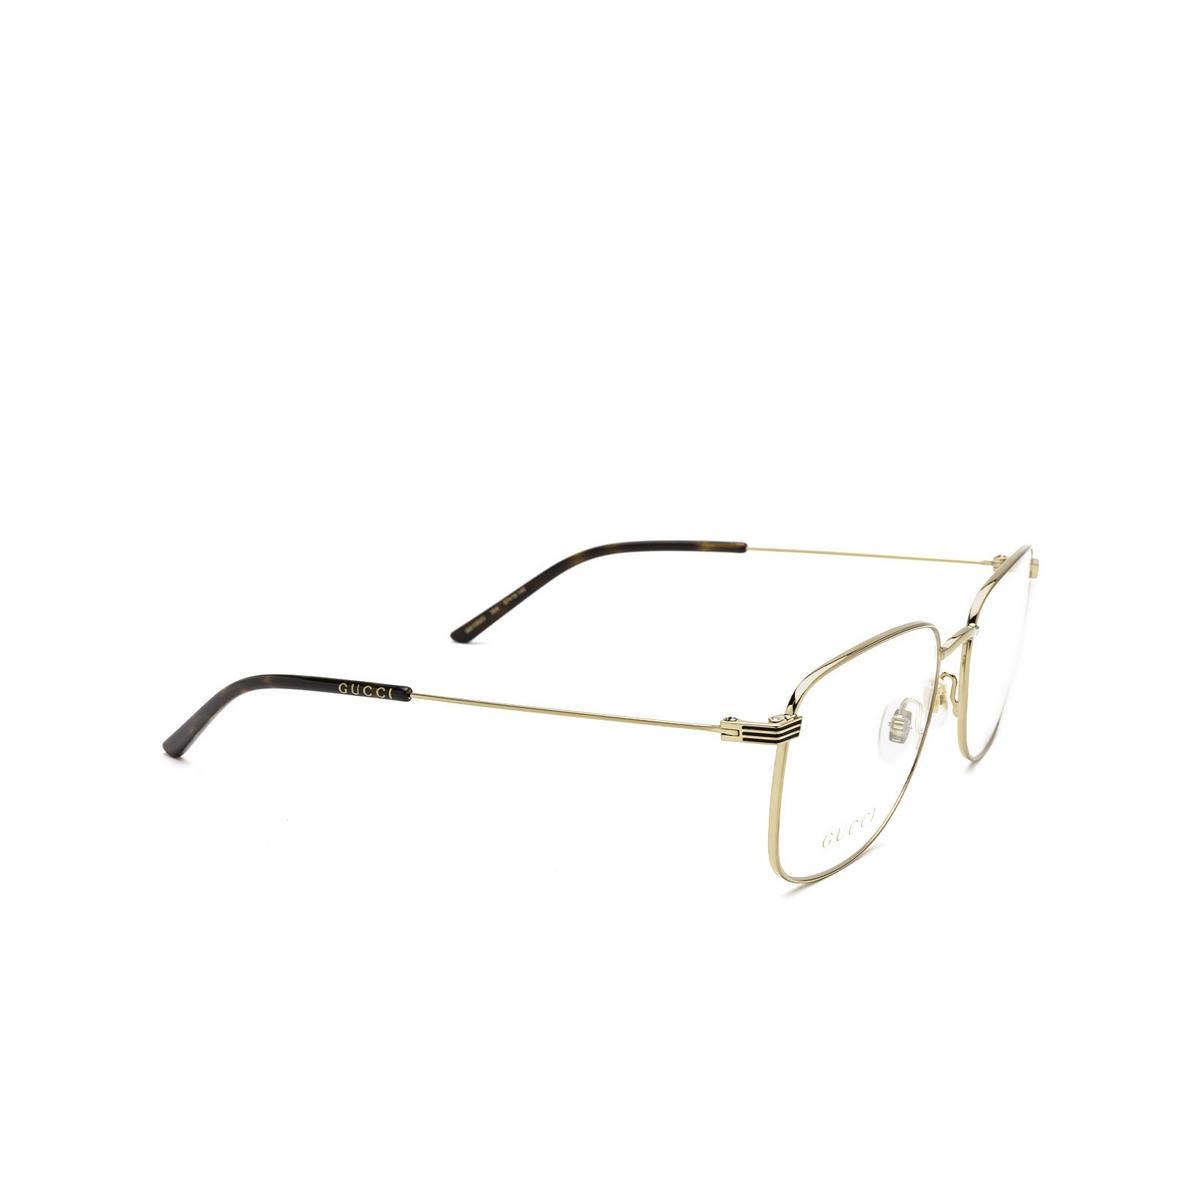 Gucci® Square Eyeglasses: GG1052O color Gold 004 - three-quarters view.